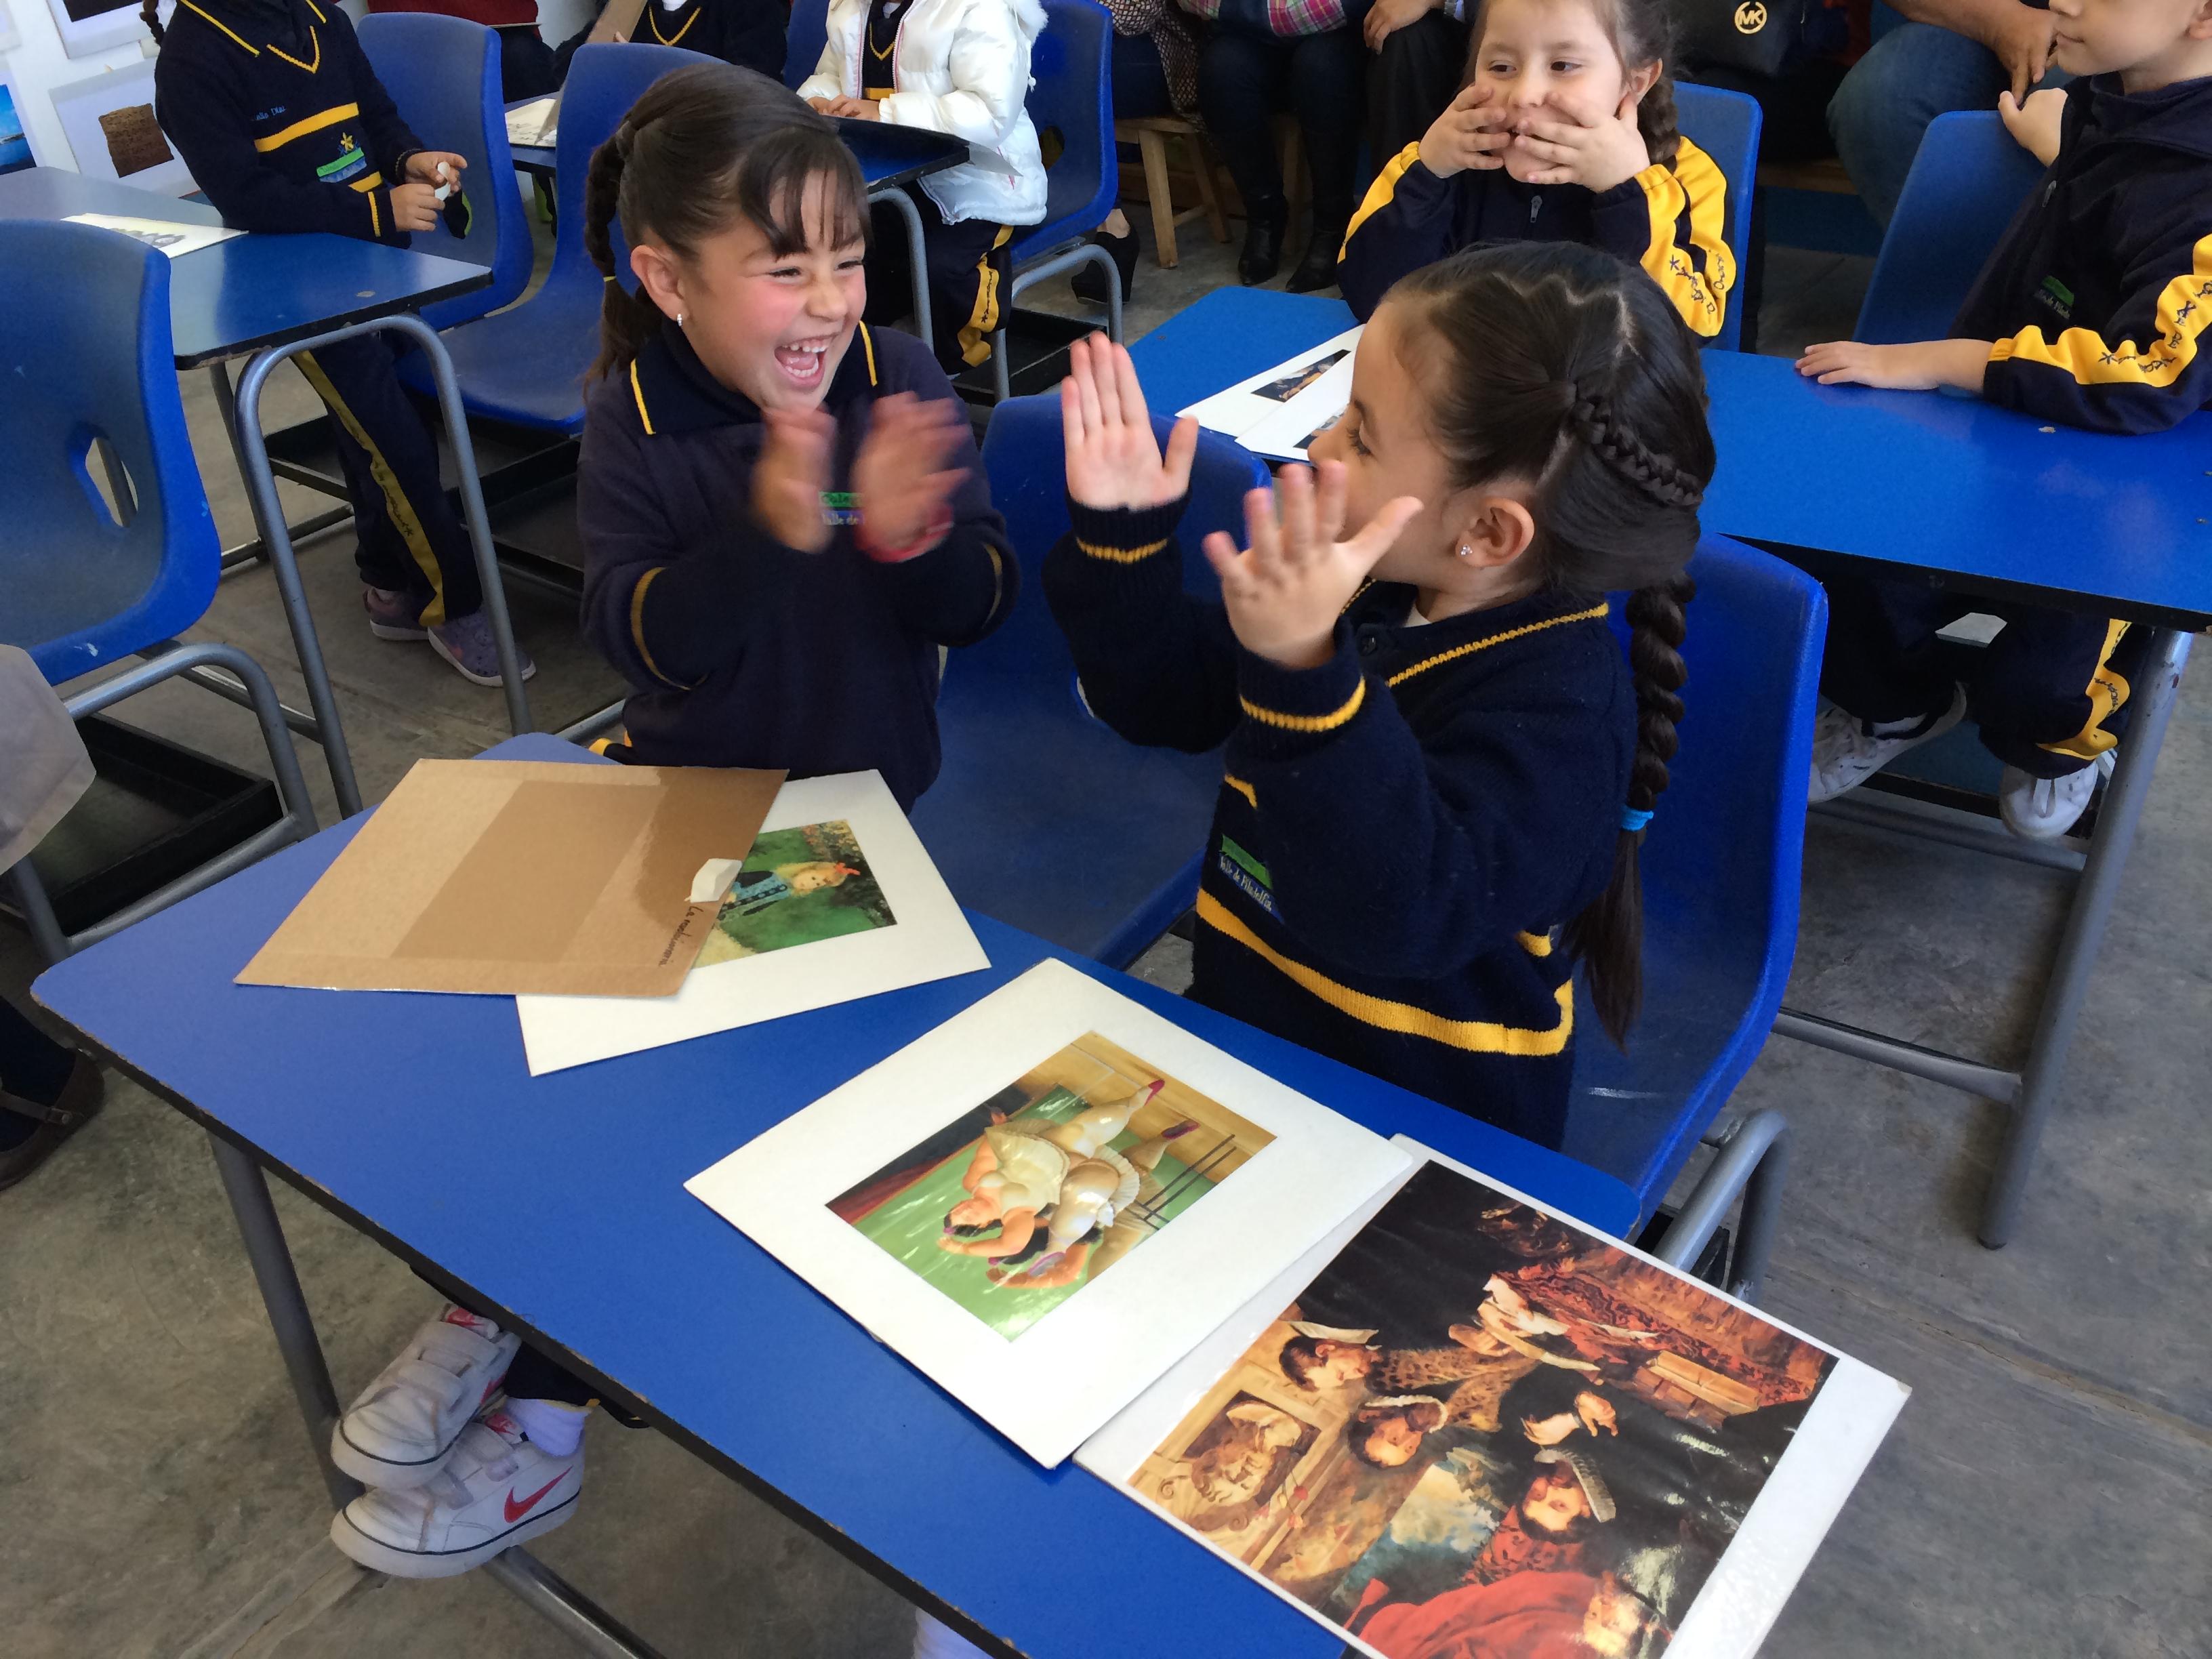 طفلتان جالستان على مقاعد دراسية تضحكان (Courtesy of Colegio Valle de Filadelfia)